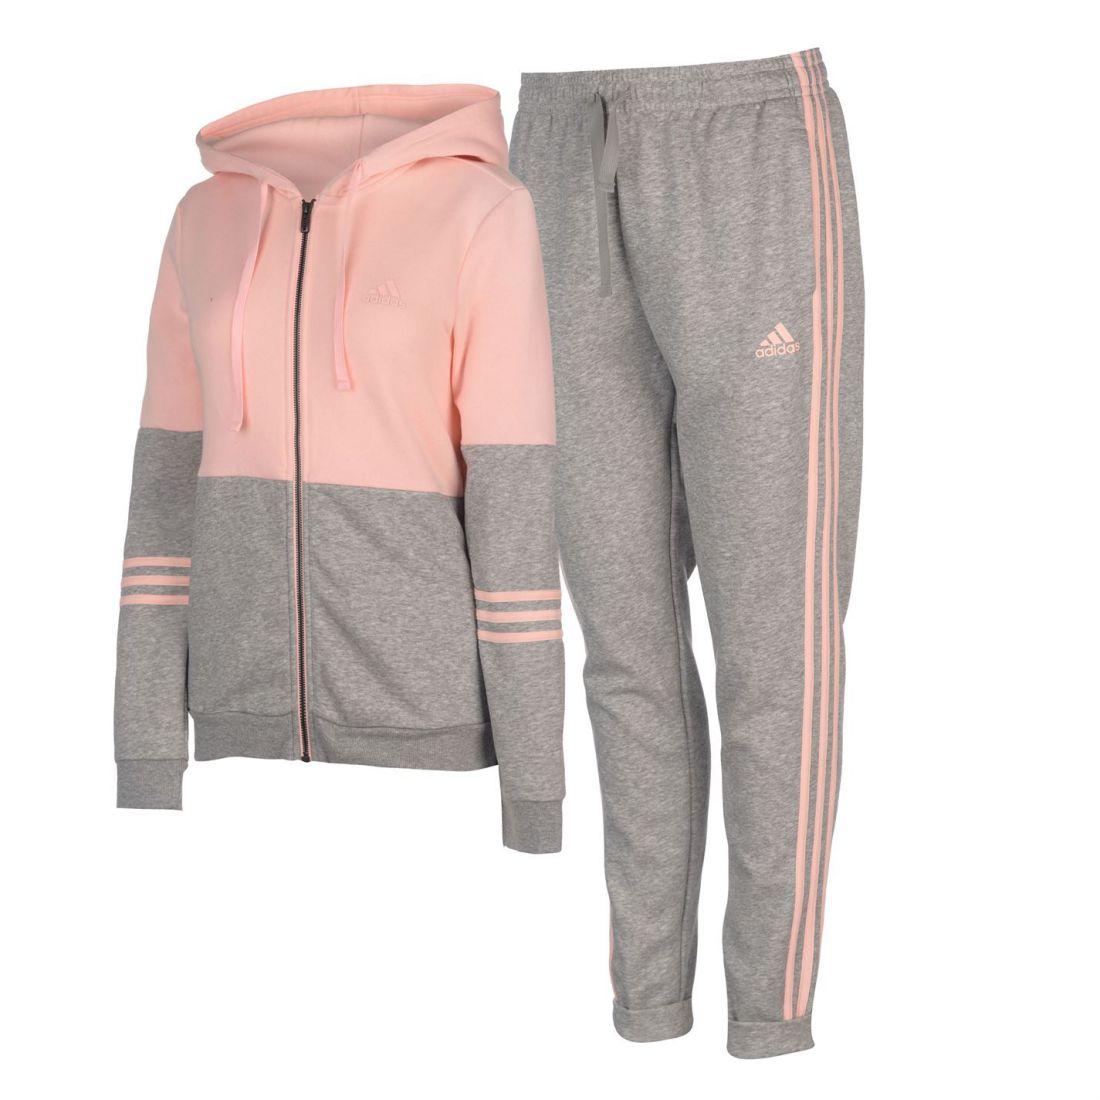 16d15f713c5 Image is loading adidas-Energize-Tracksuit-Ladies-Fleece-Full-Length-Sleeve-